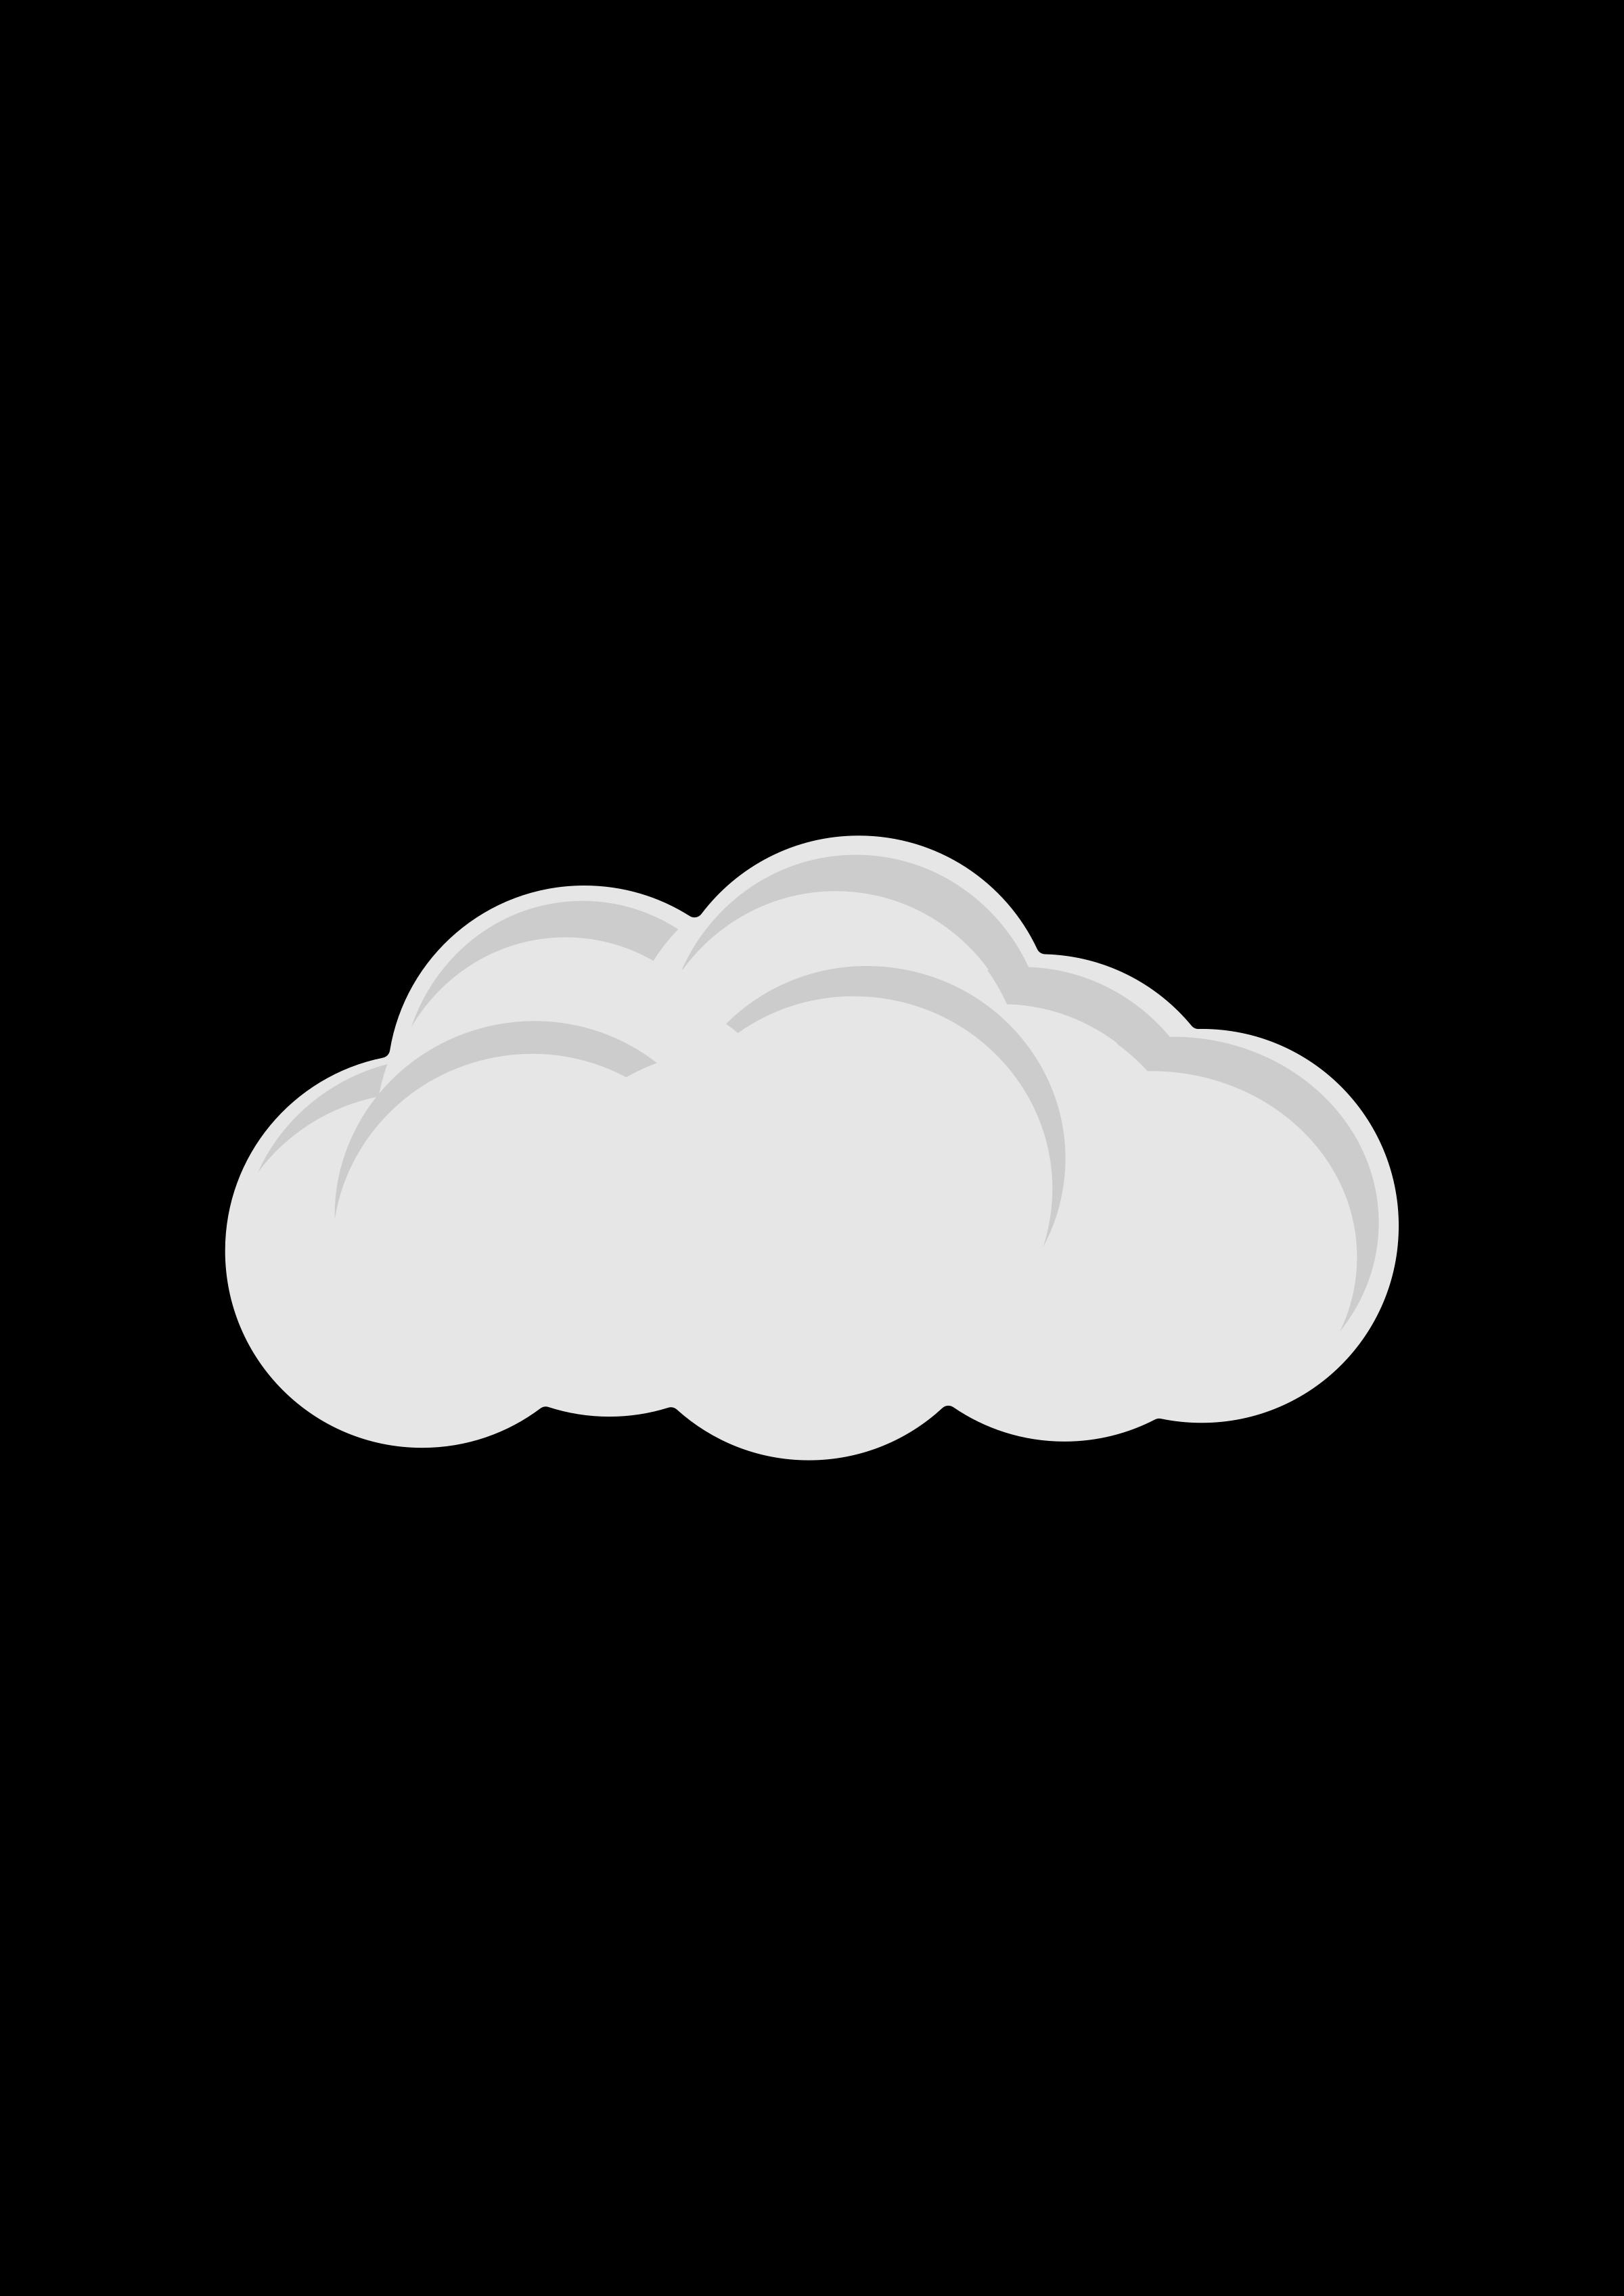 Big image png. Cloud clipart simple